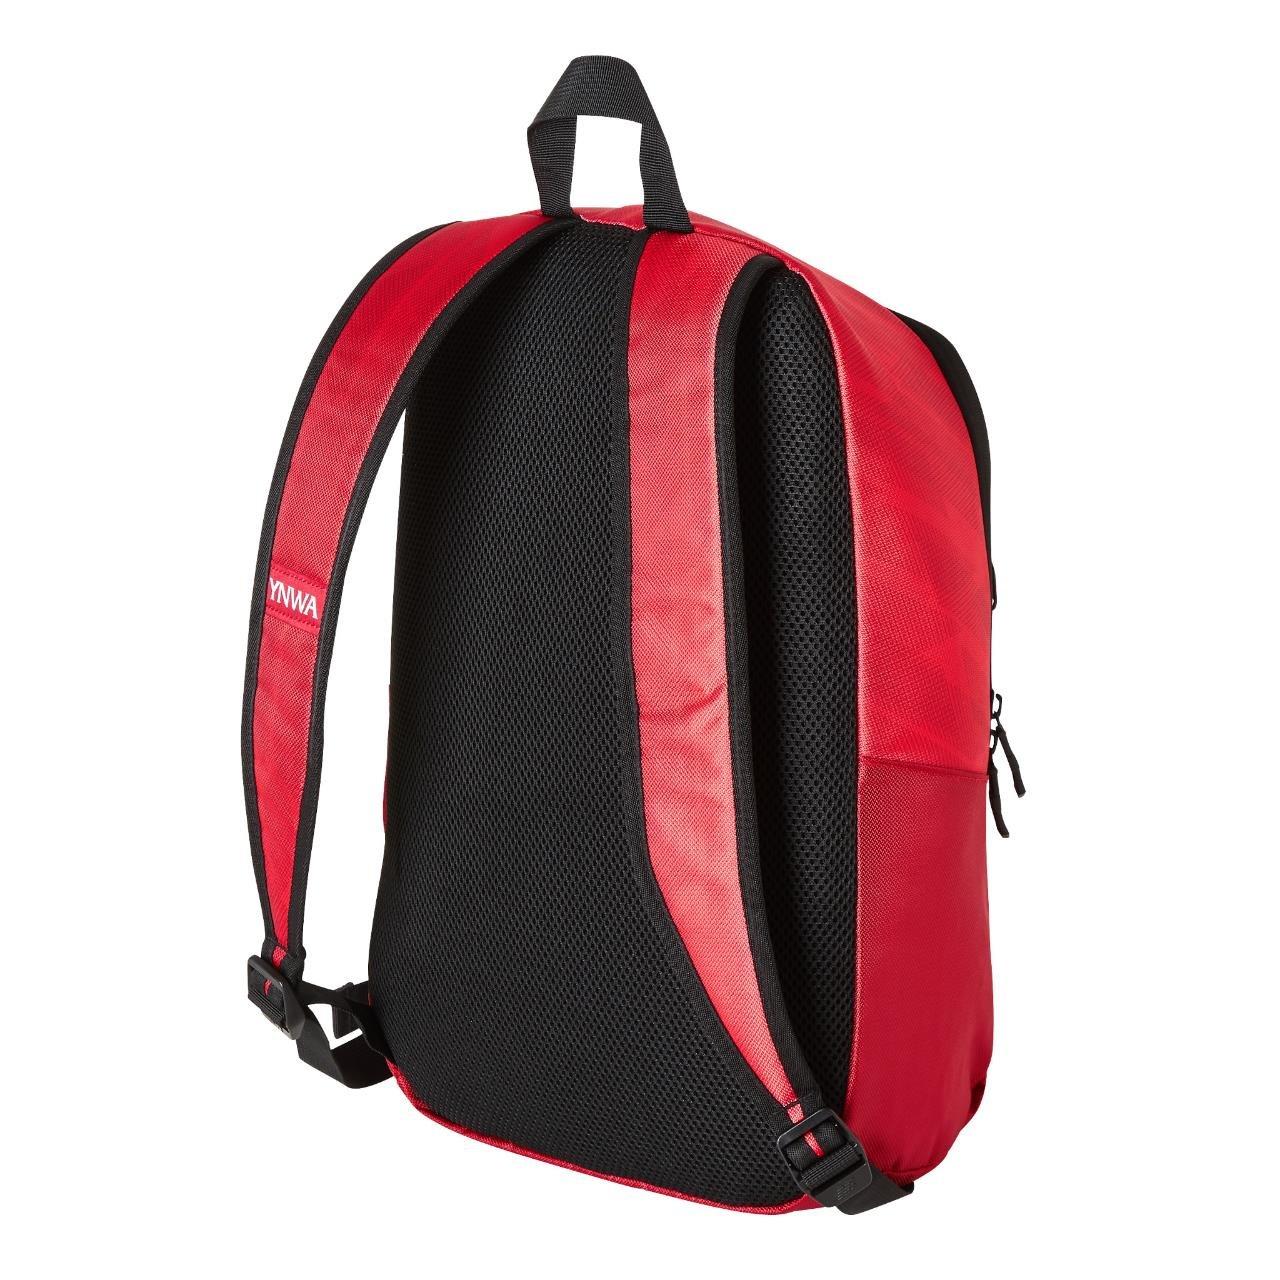 68bdb615f01 New Balance Liverpool FC Medium Backpack 2018-19  Amazon.co.uk  Sports    Outdoors